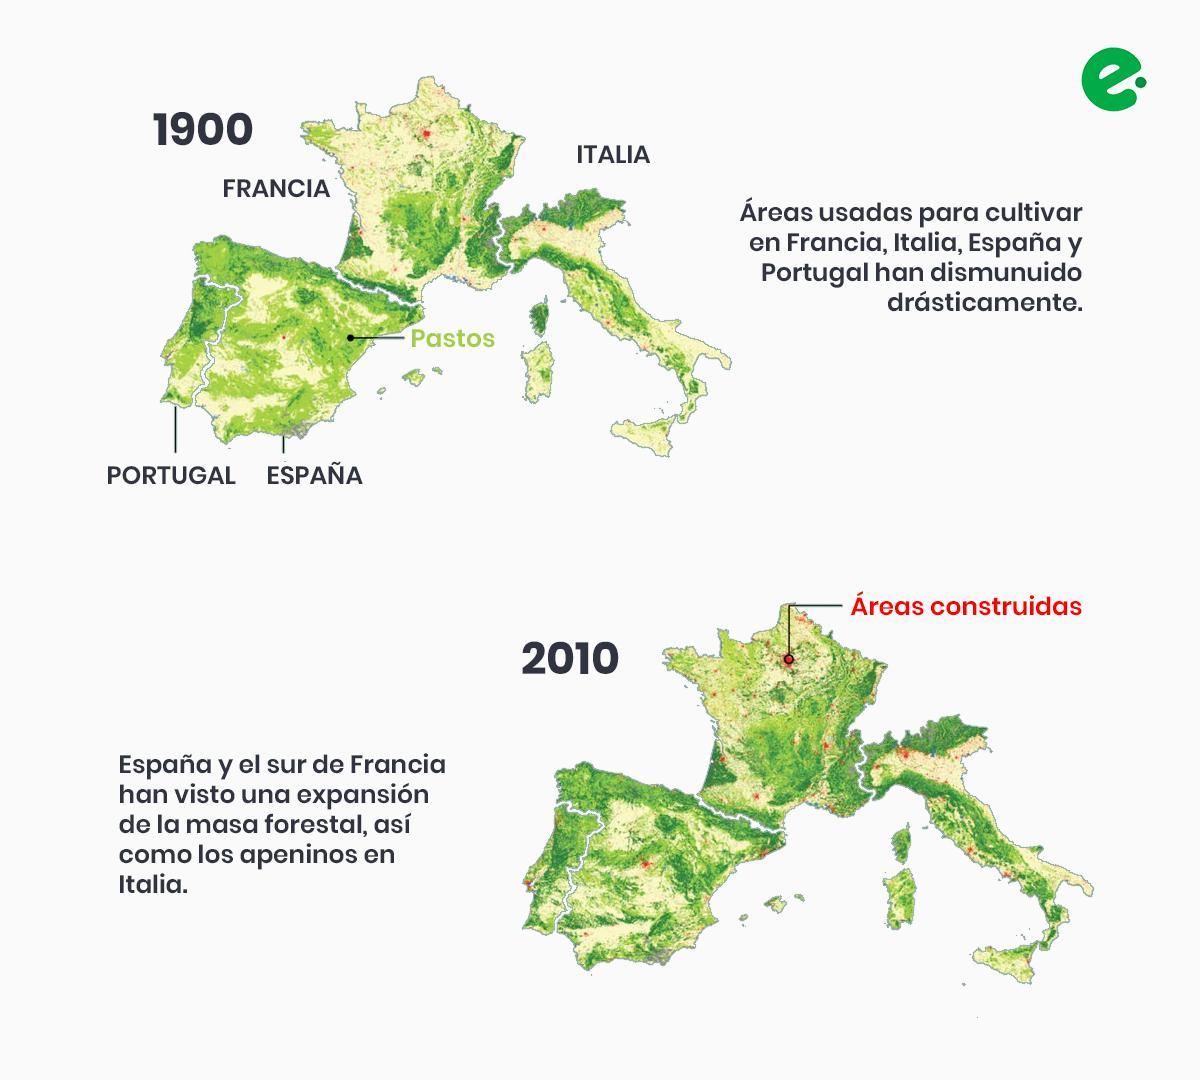 recuperacion-bosques-espana-portugal-francia-italia (1)